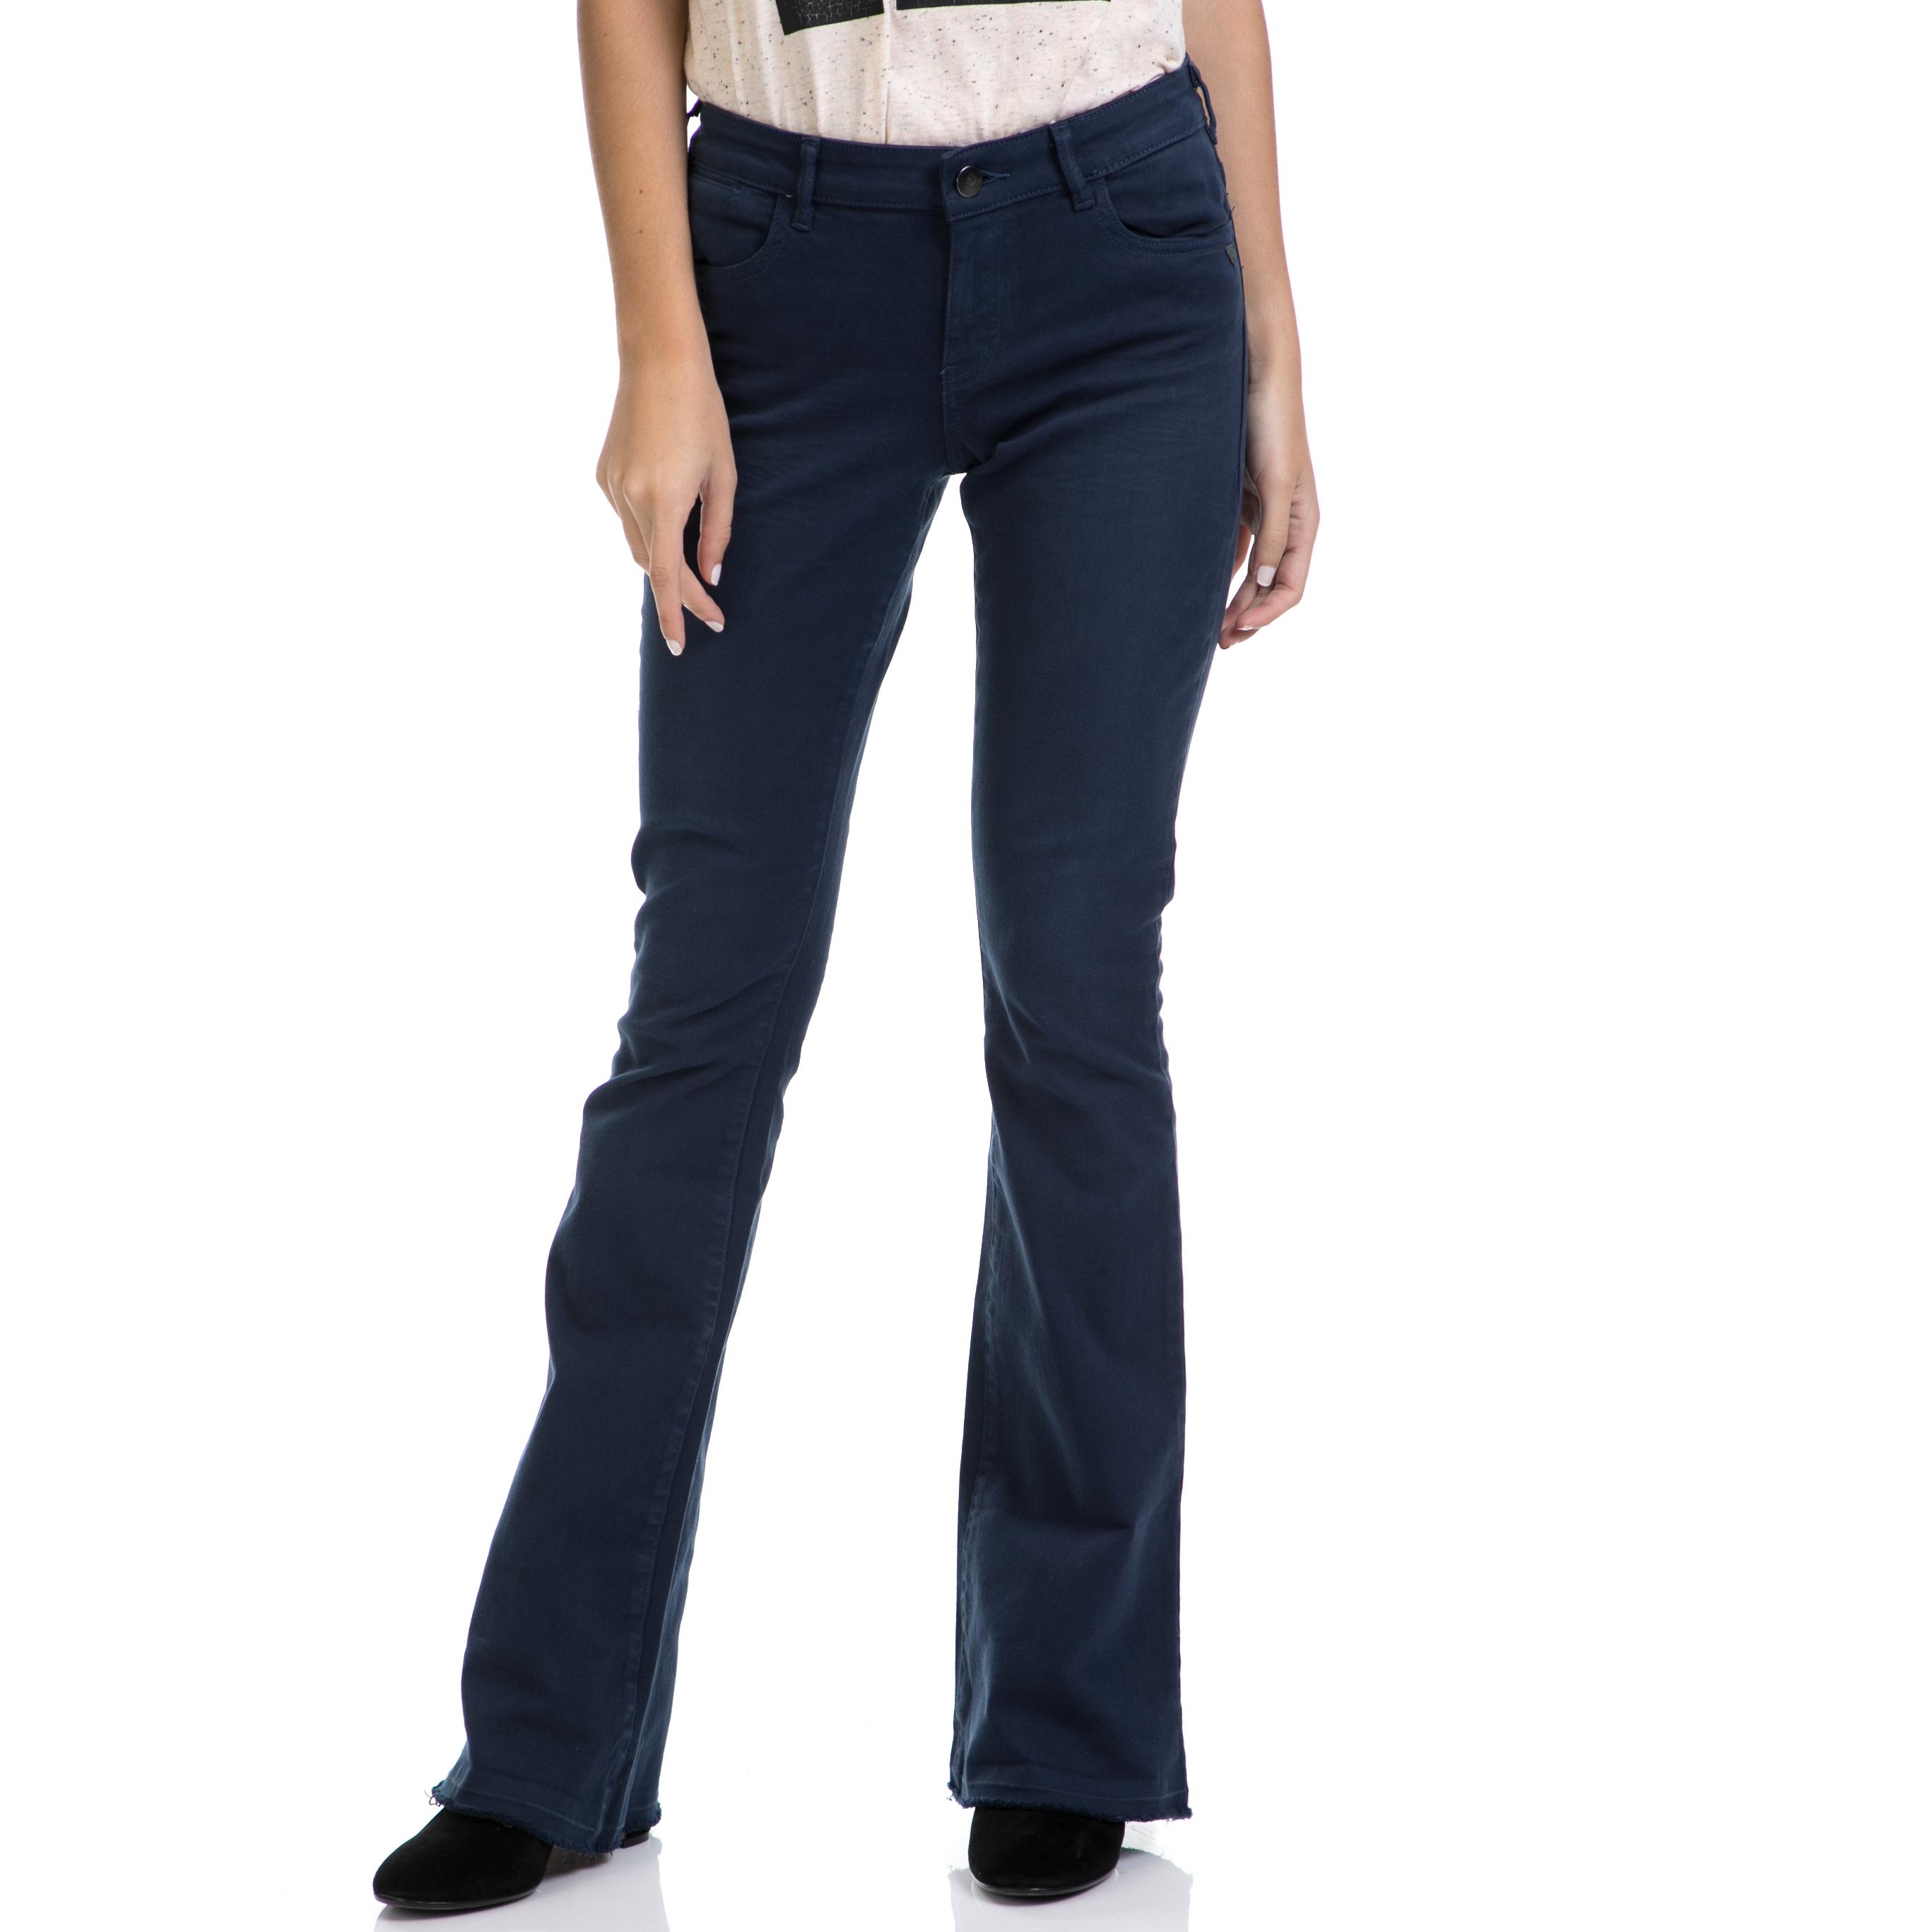 MAISON SCOTCH – Γυναικείο τζιν παντελόνι JONI MAISON SCOTCH μπλε